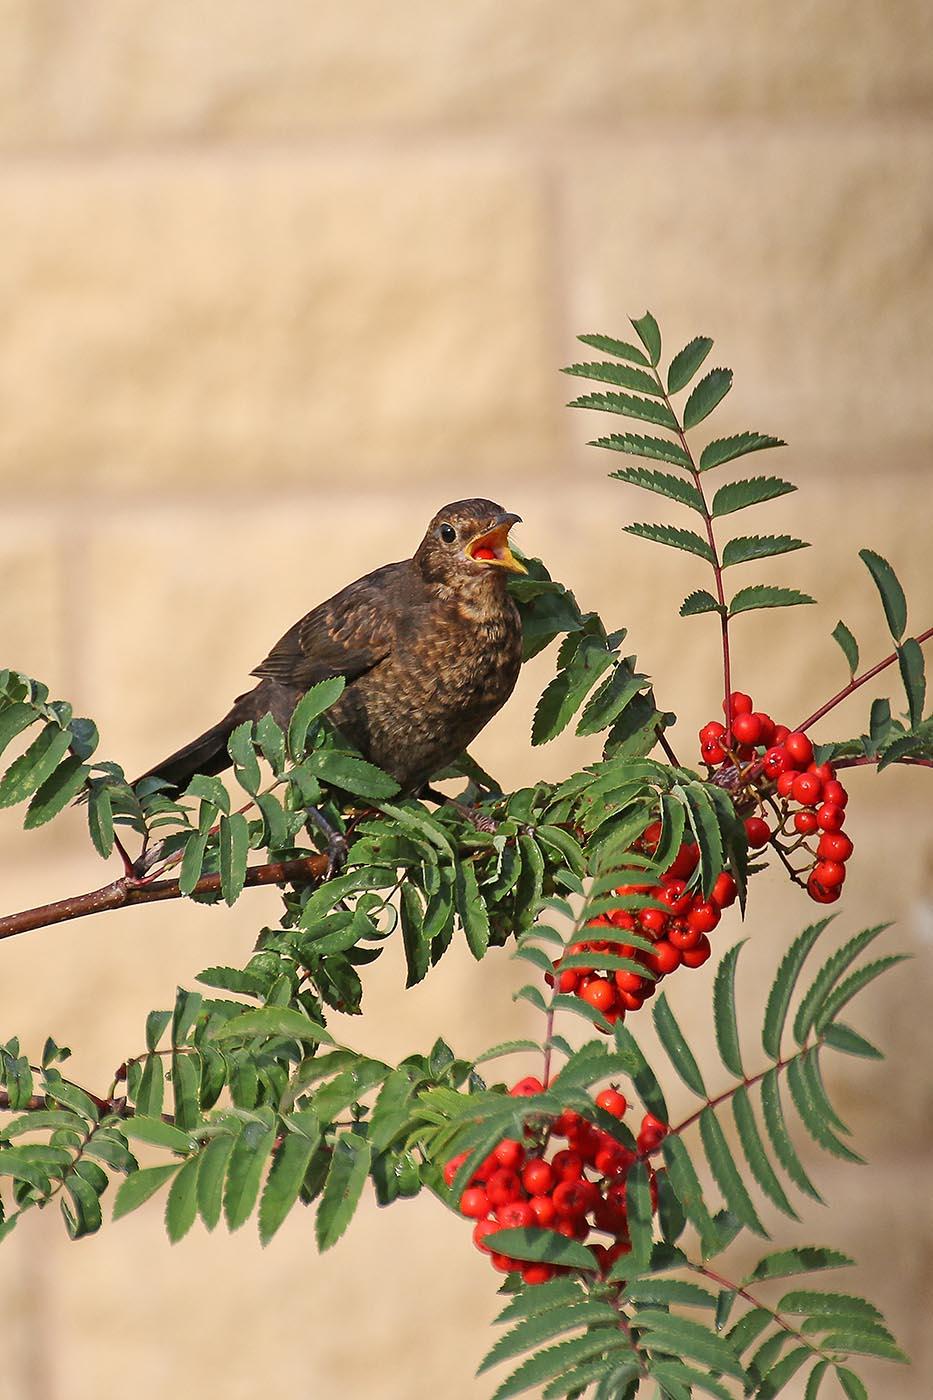 Female blackbird feeding on berries